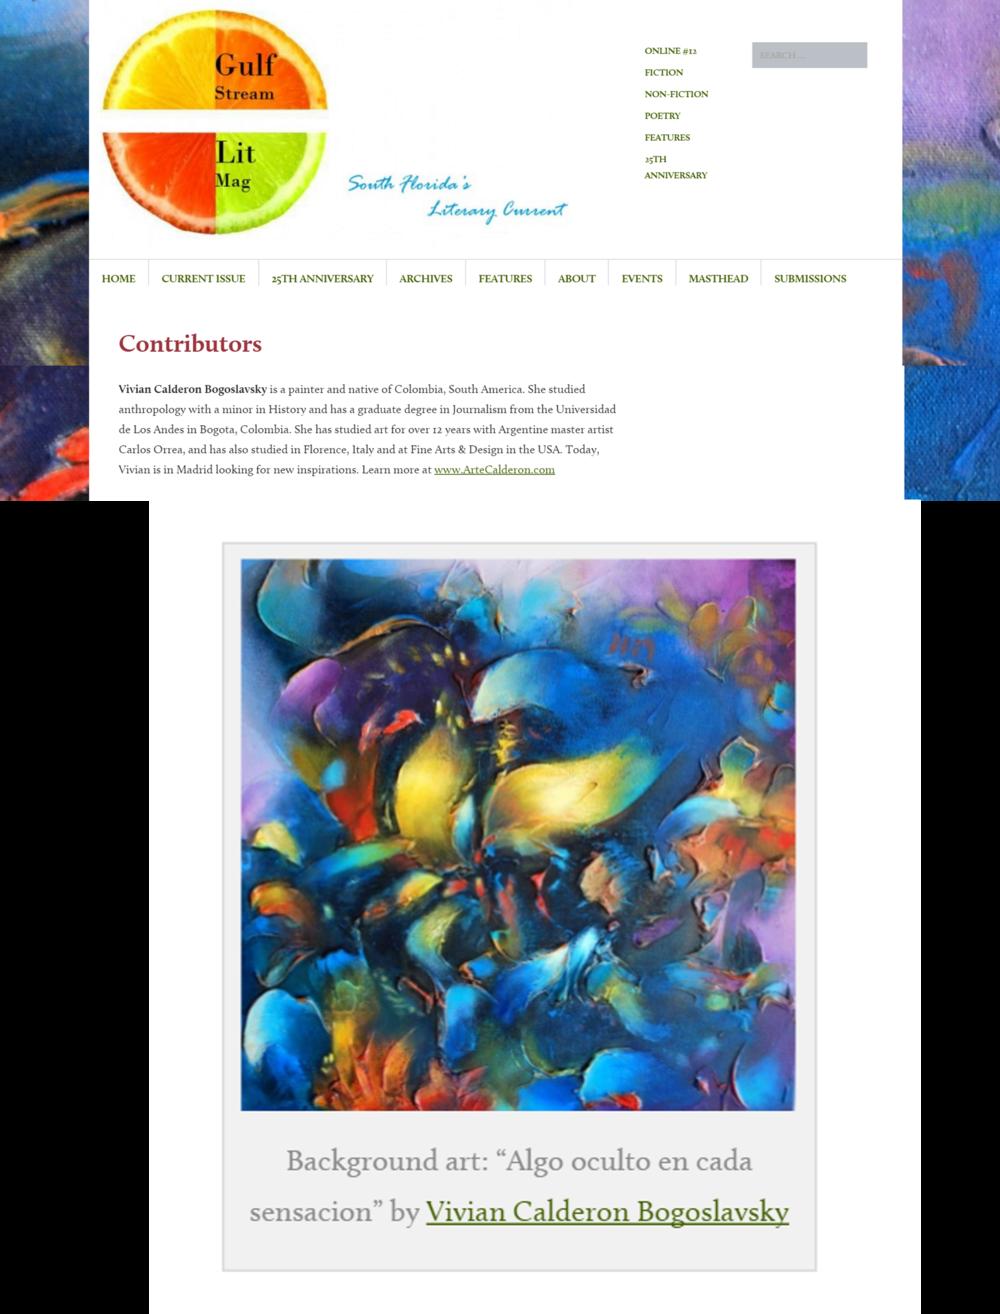 Gulf StreamLit Magazine